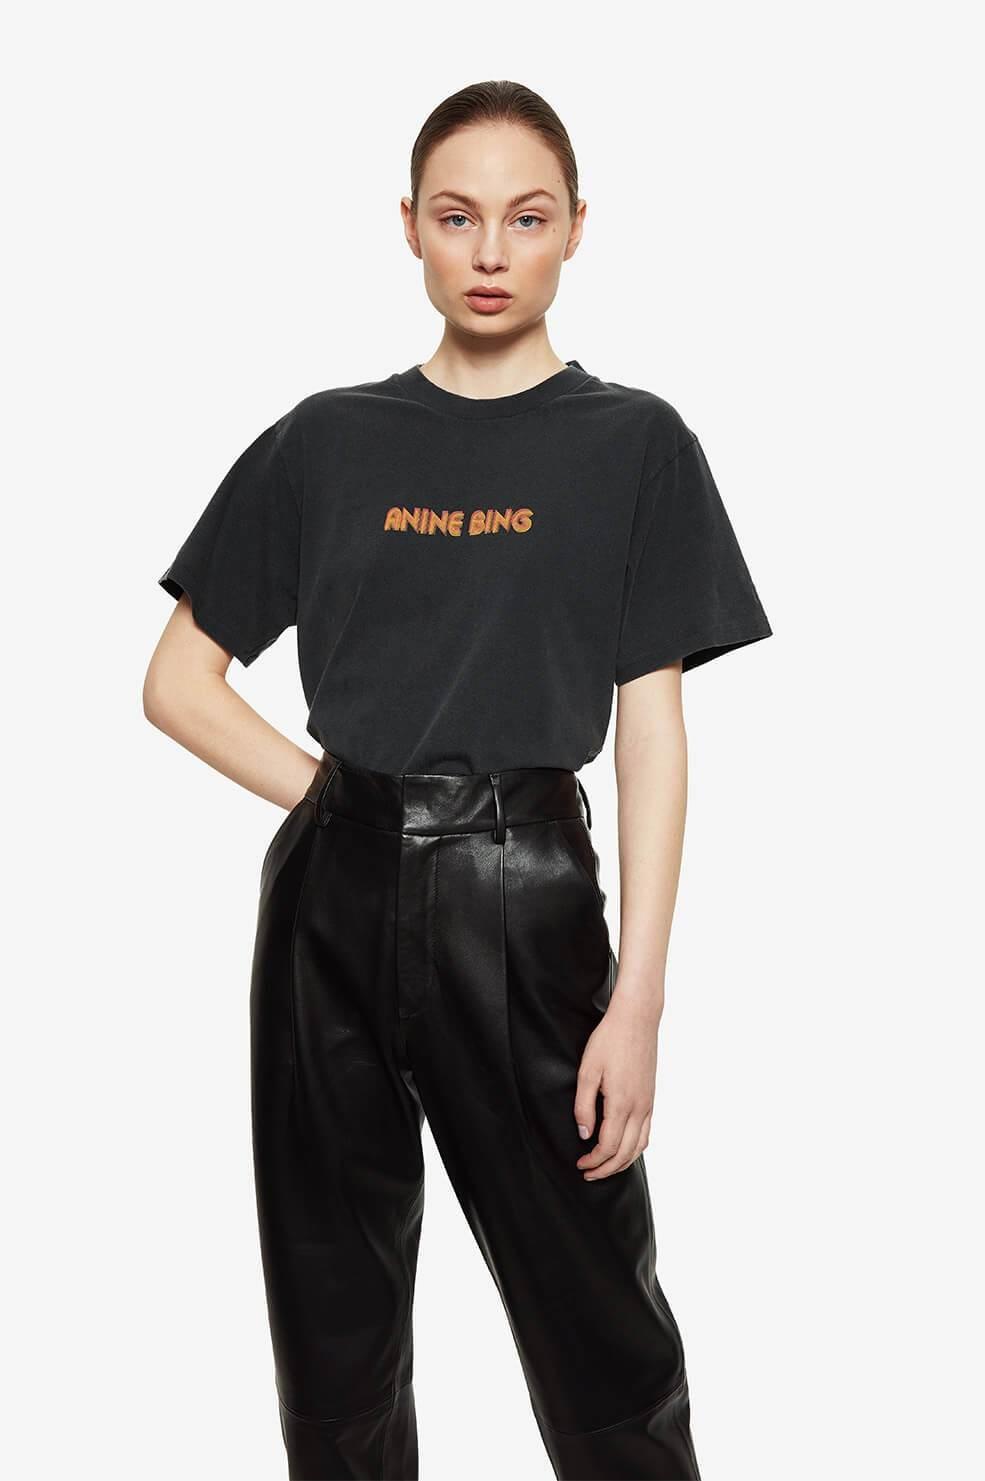 ANINE BING t shirt lili retro-2